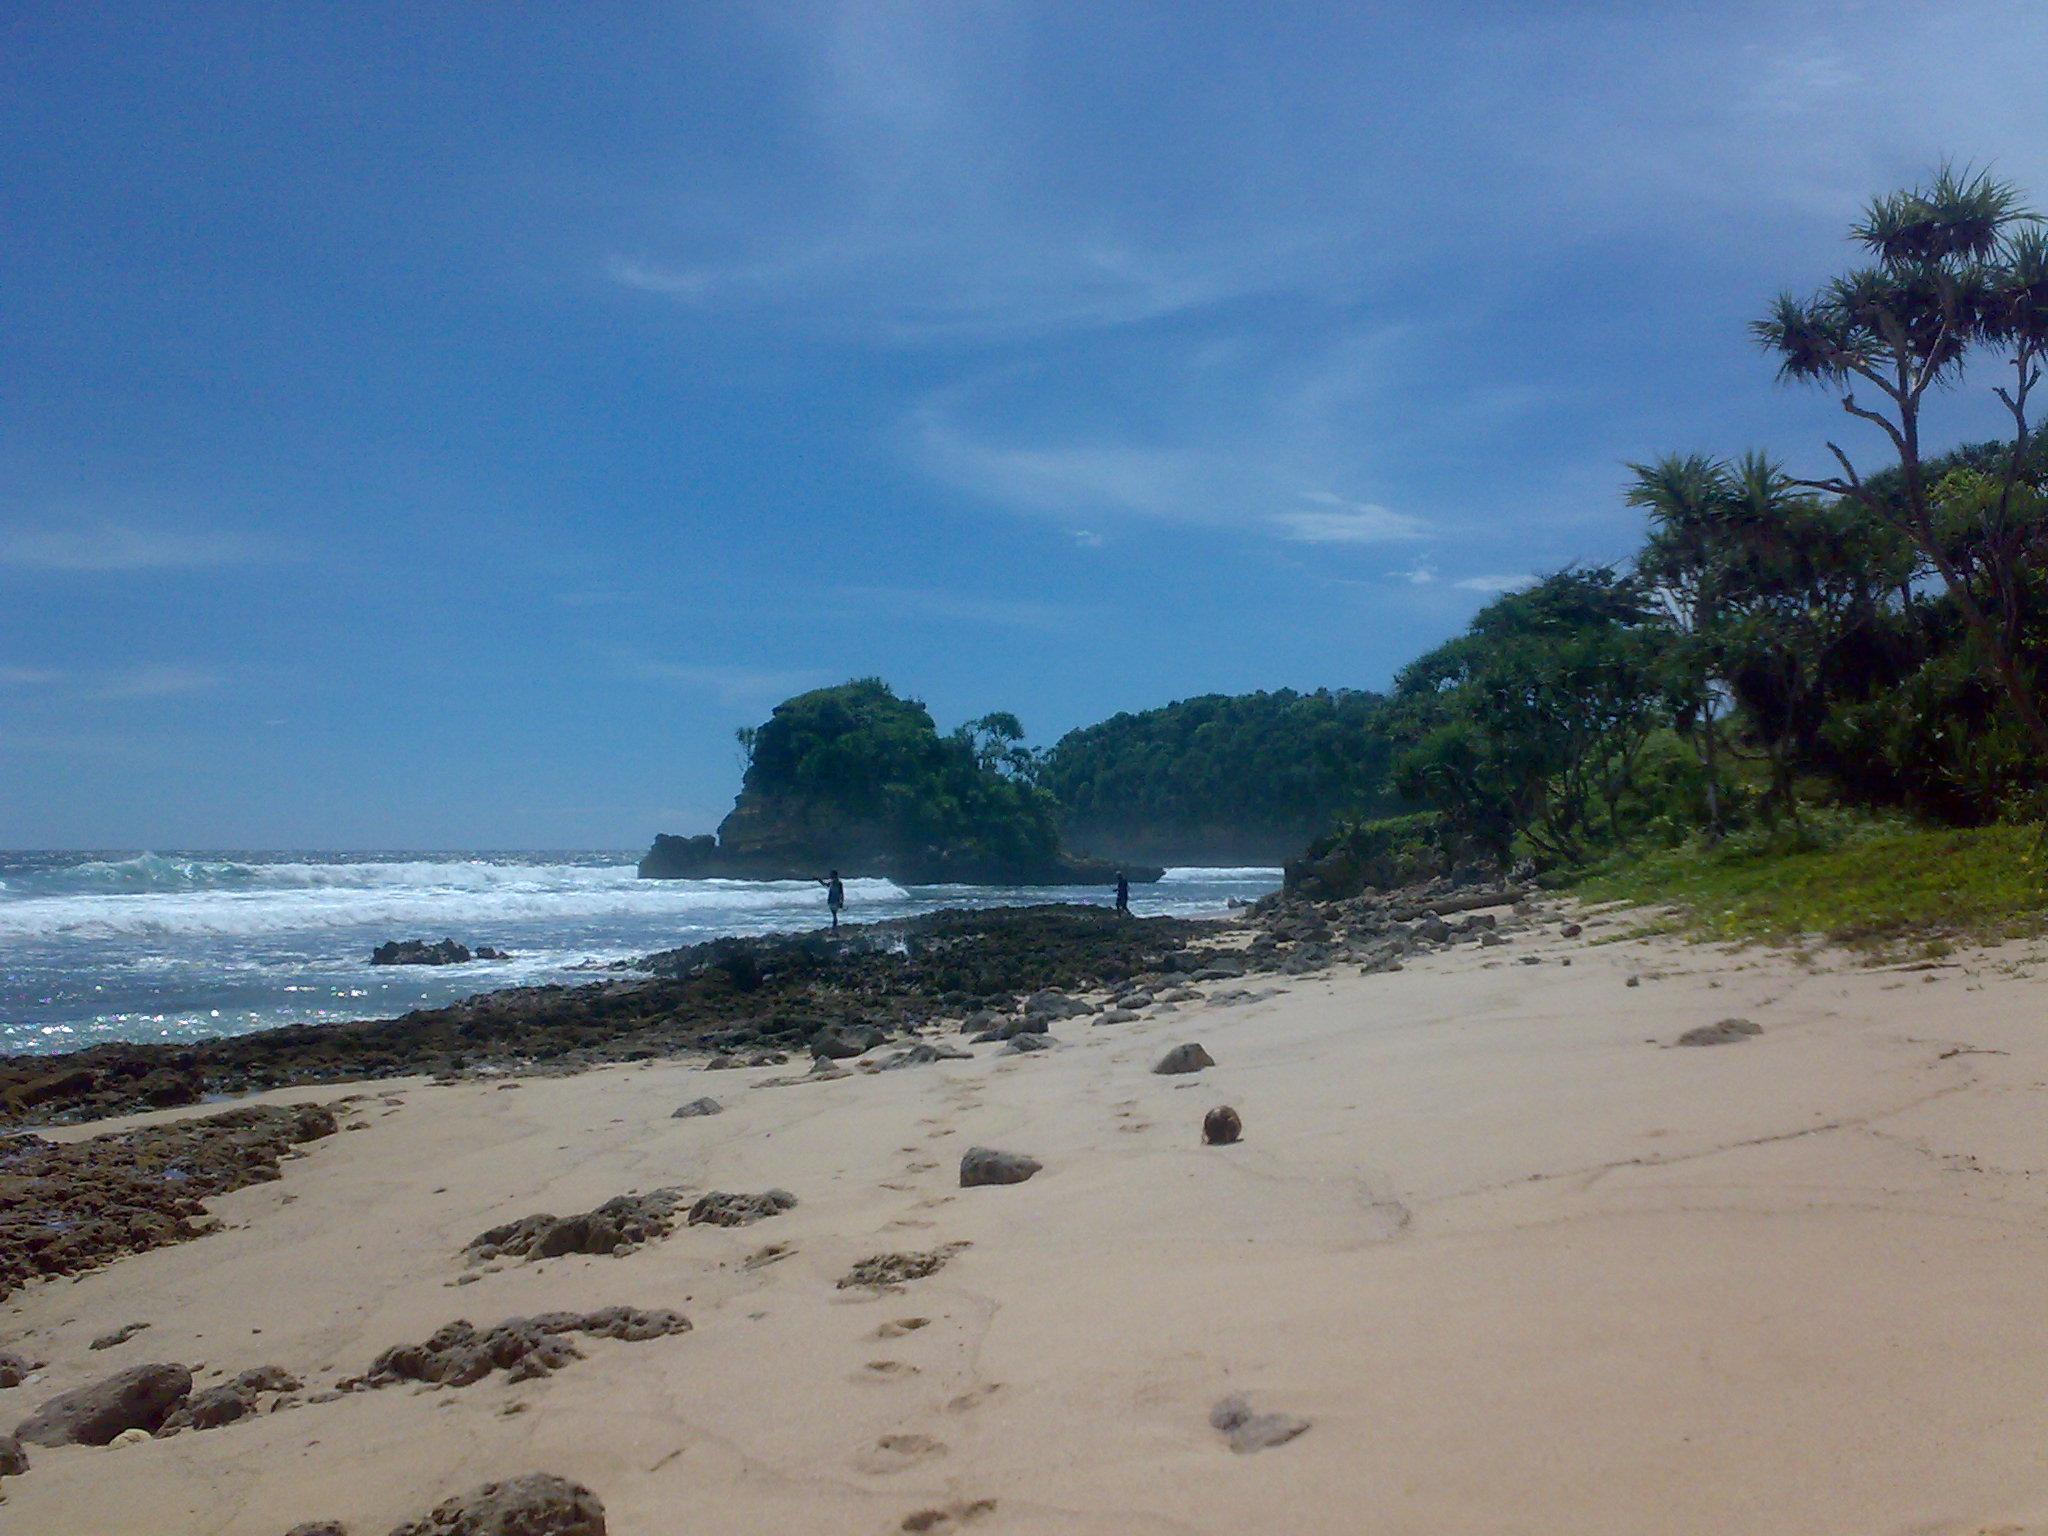 Pantai Jongreng Saloko Kecamatan Donomulyo Pesona Malang Memang Tidak Bisa